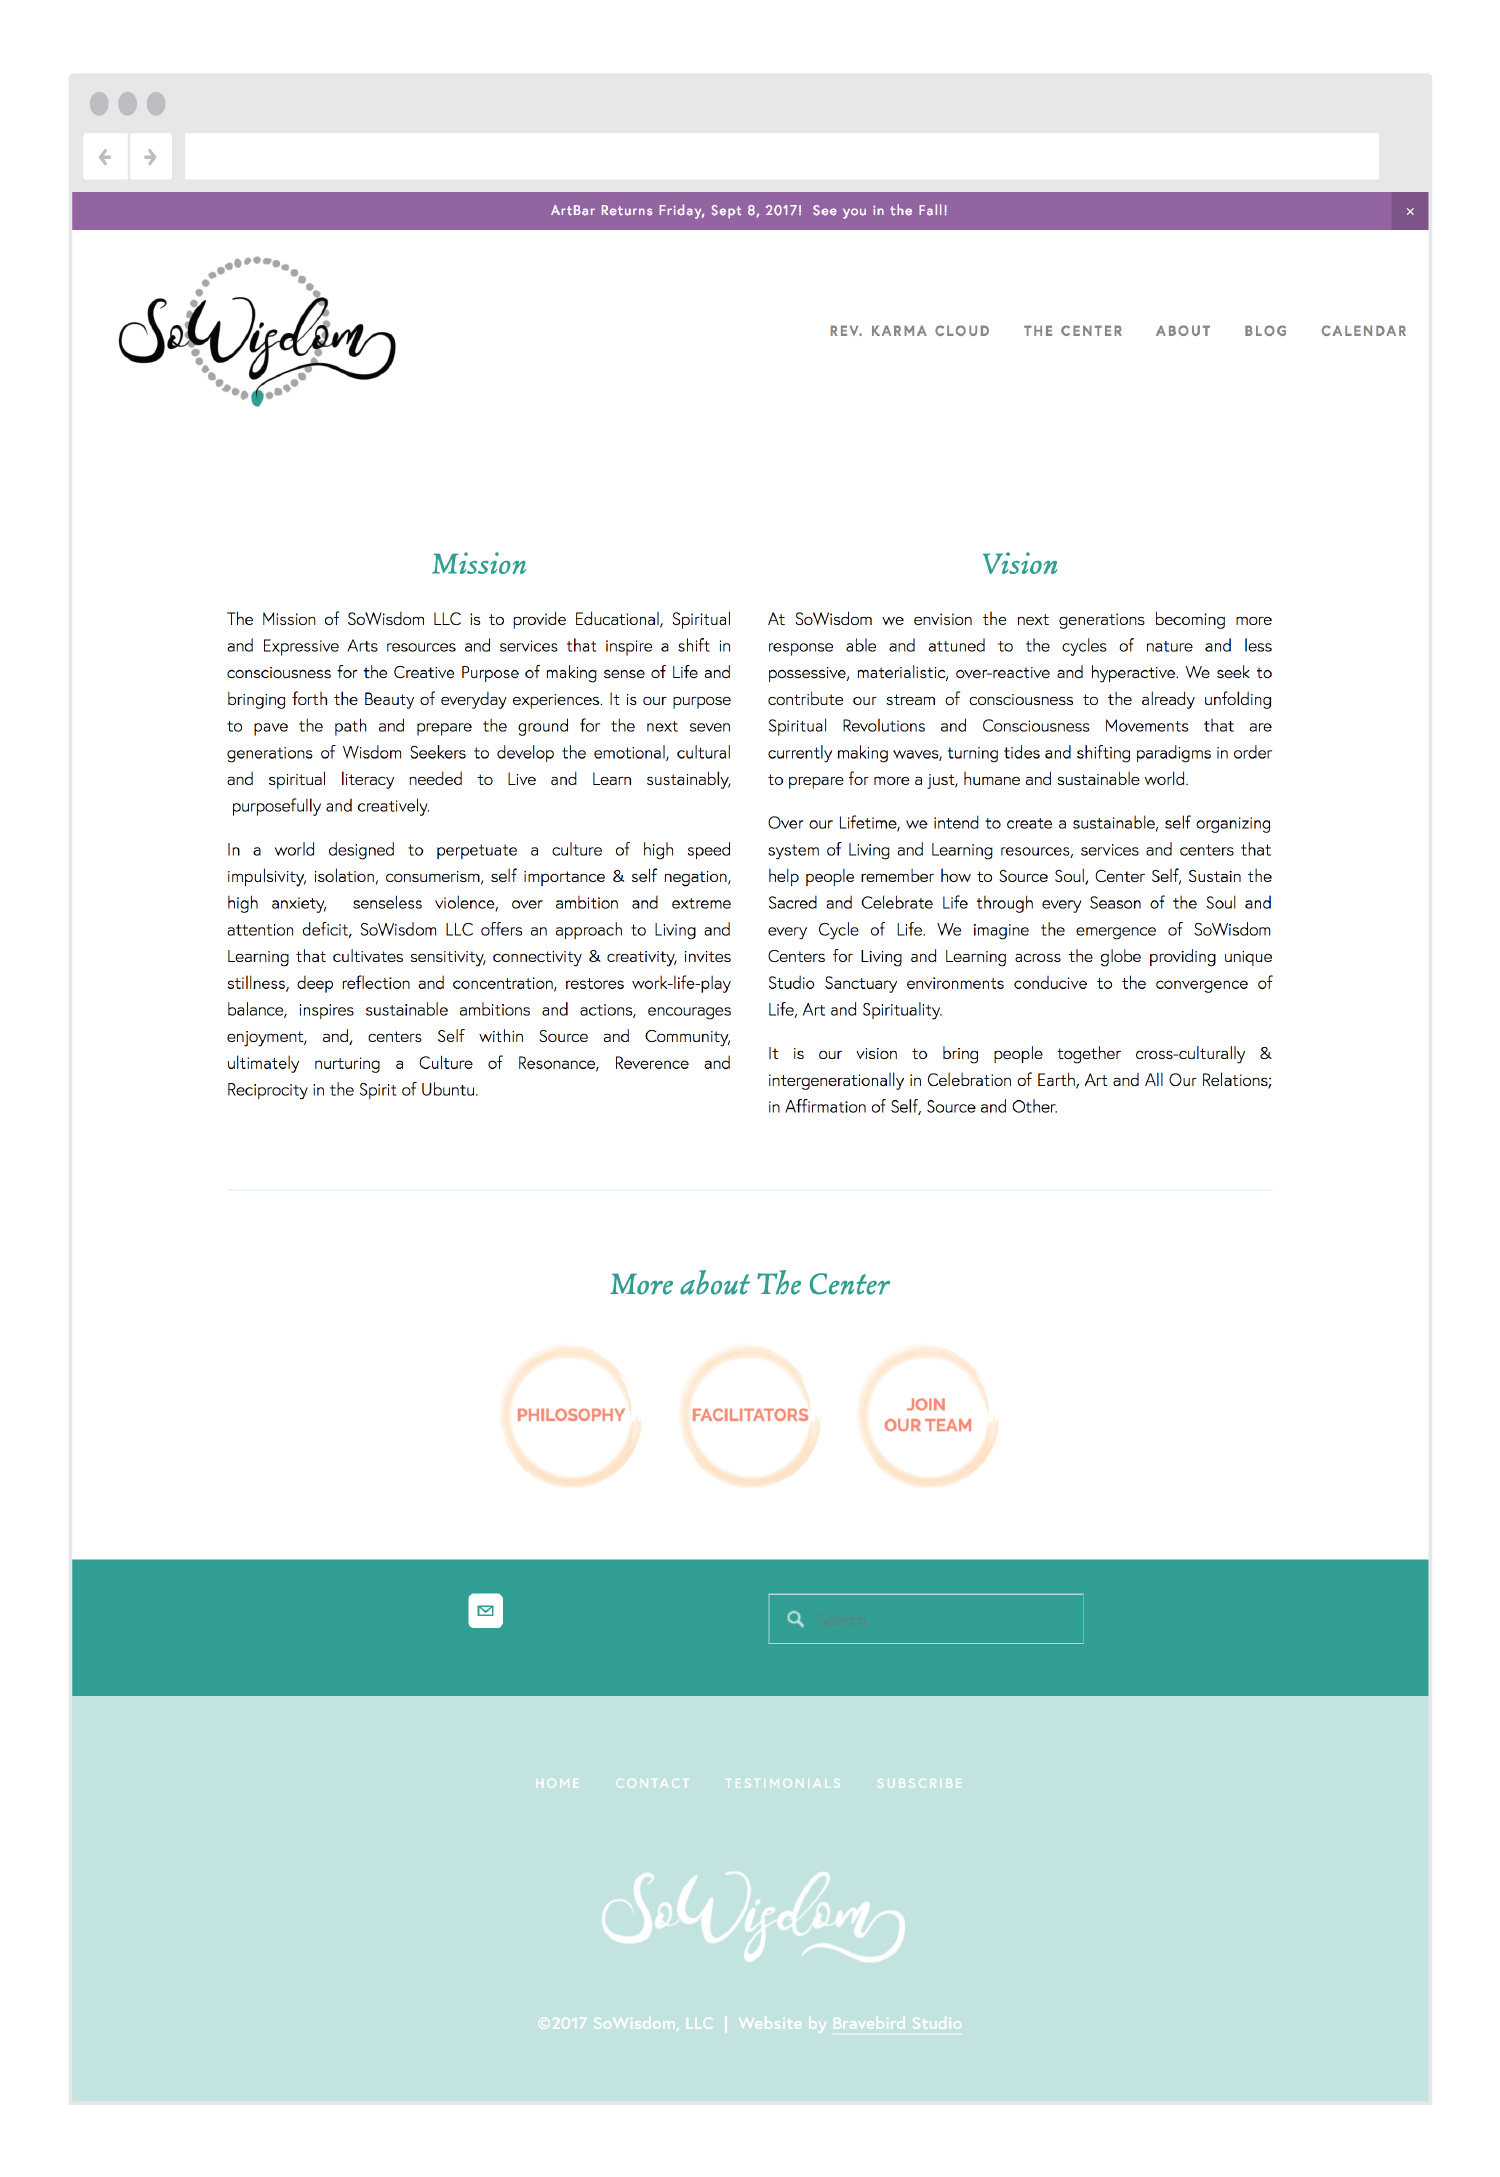 SoWisdom-mission-vision-page-Bravebird-Studio-web-design